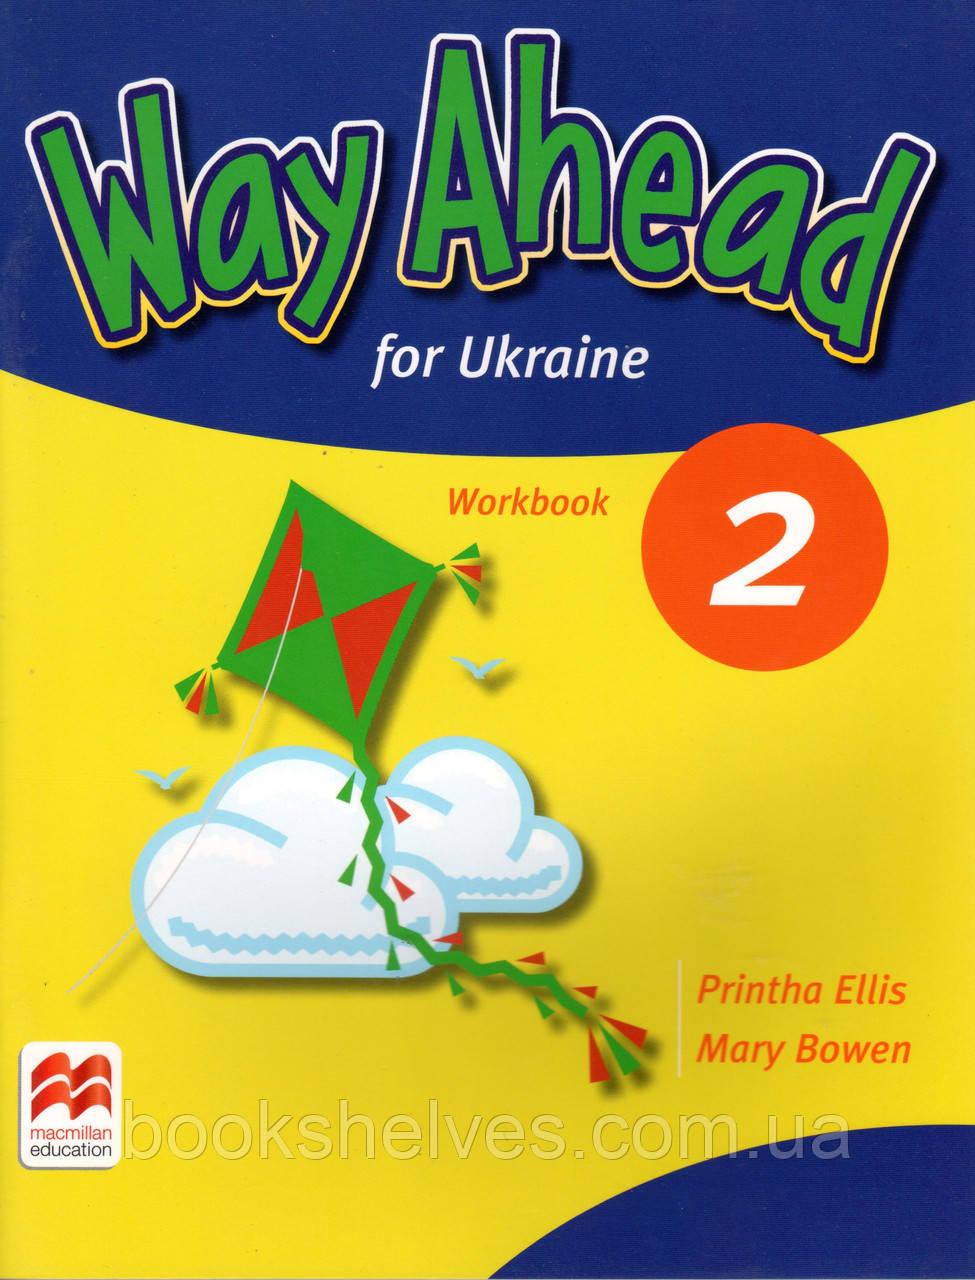 Робочий зошит Way Ahead for Ukraine 2 Workbook